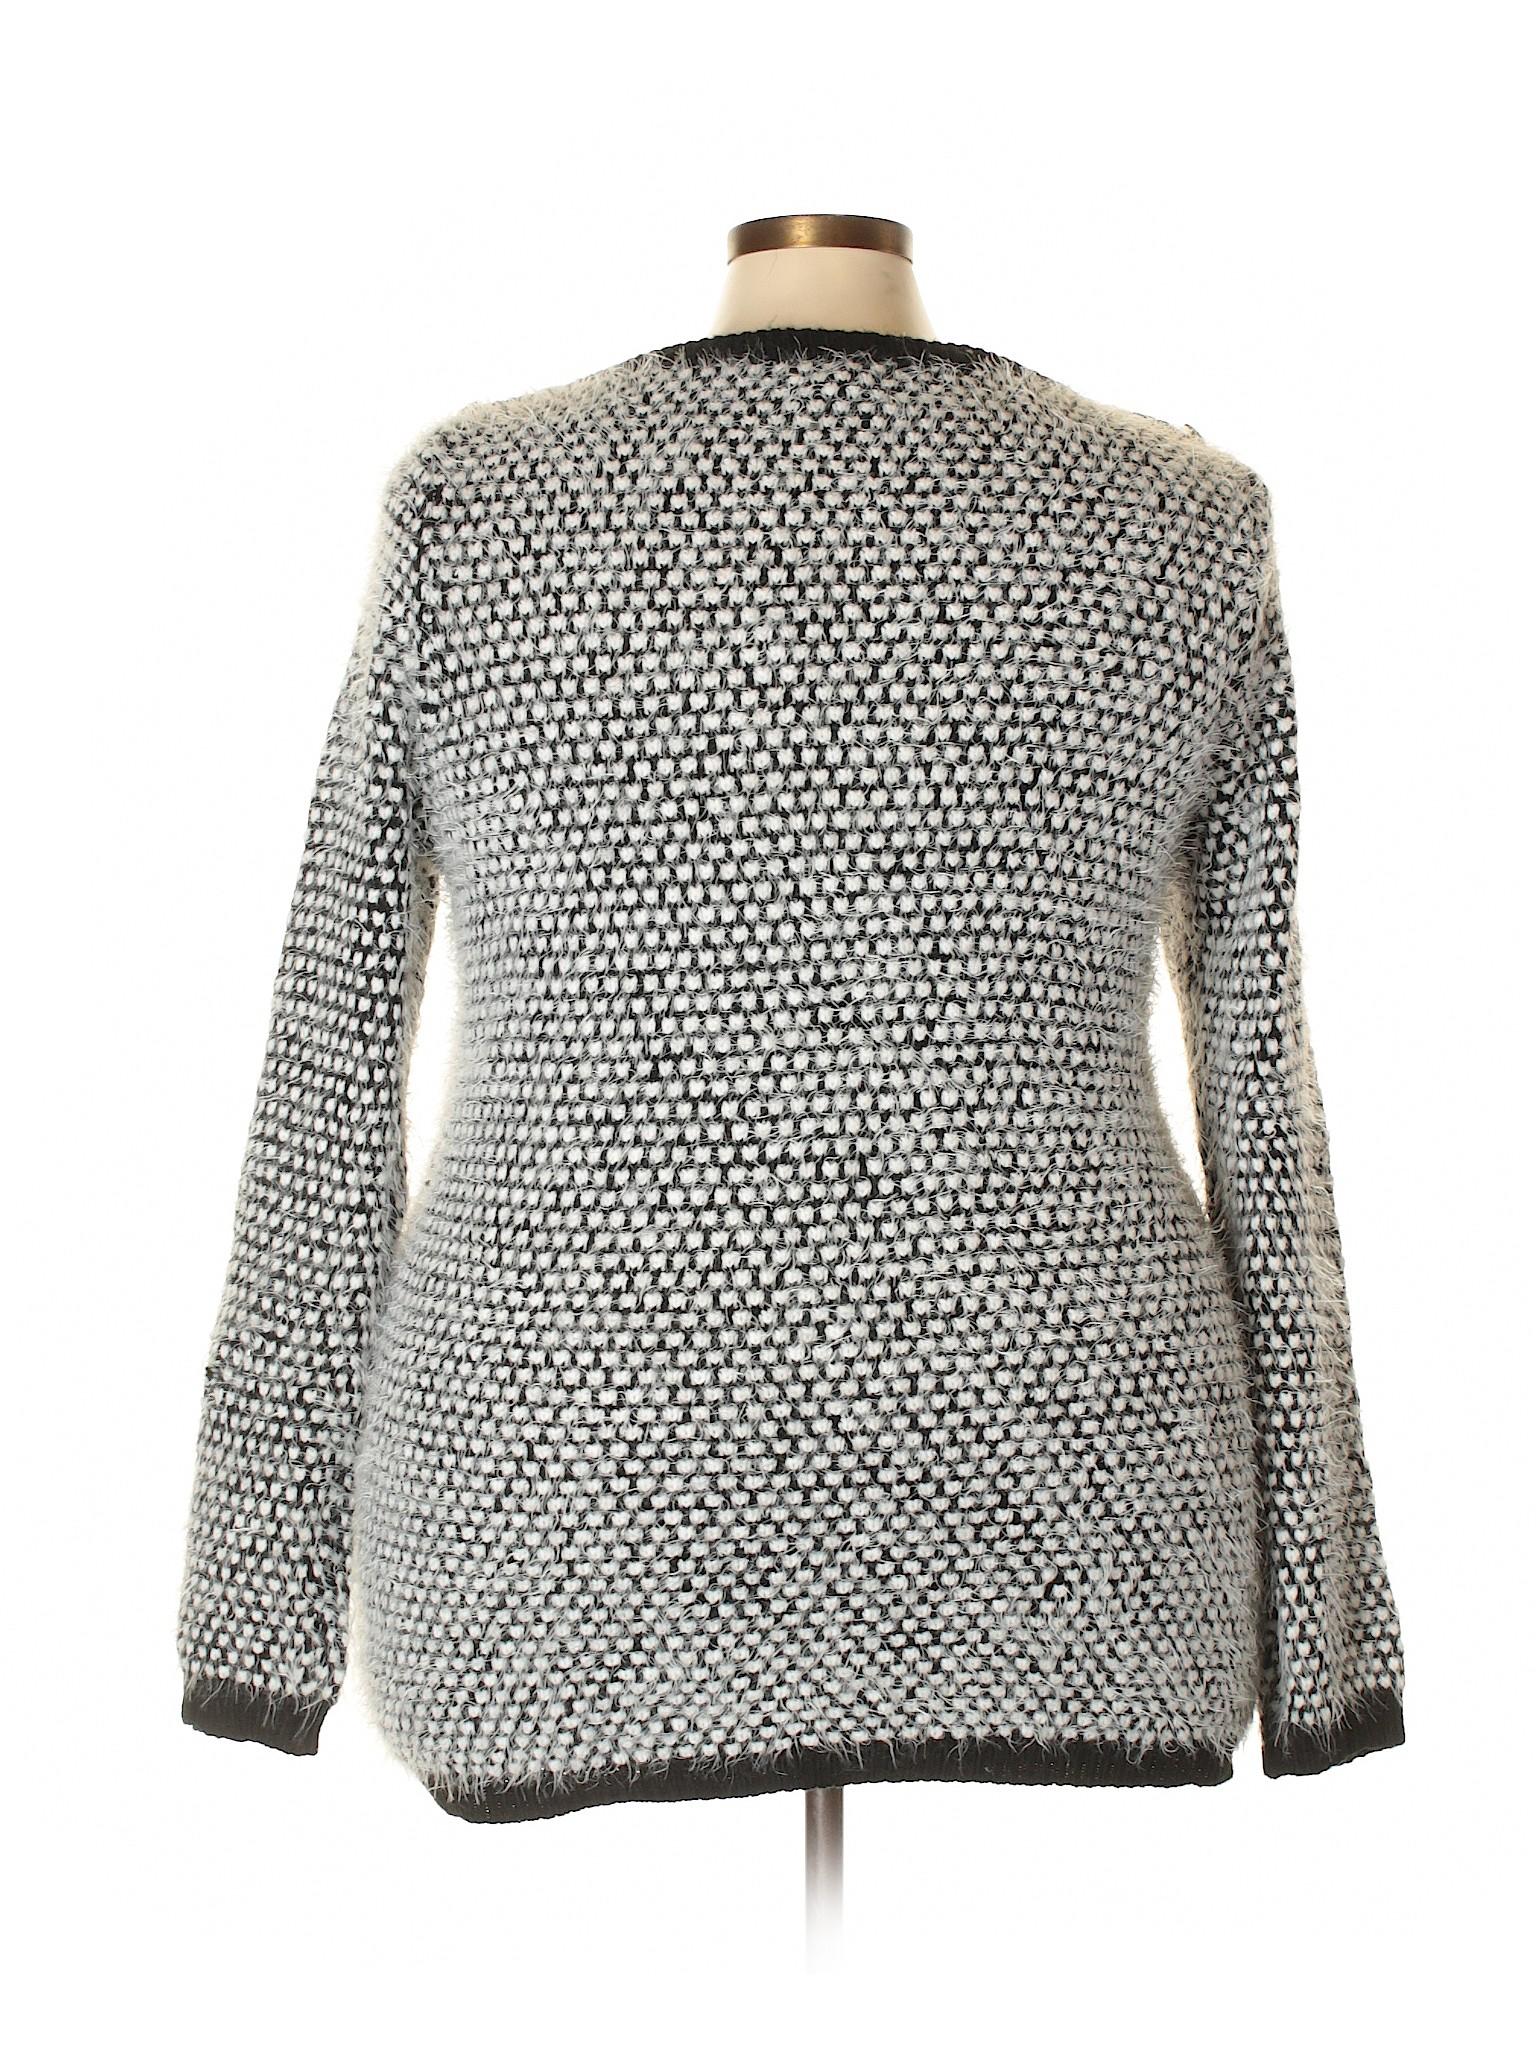 Boutique Sweater Sweater Boutique Michelle Boutique Pullover Michelle Lauren Lauren Pullover Lauren xpw1gqSY